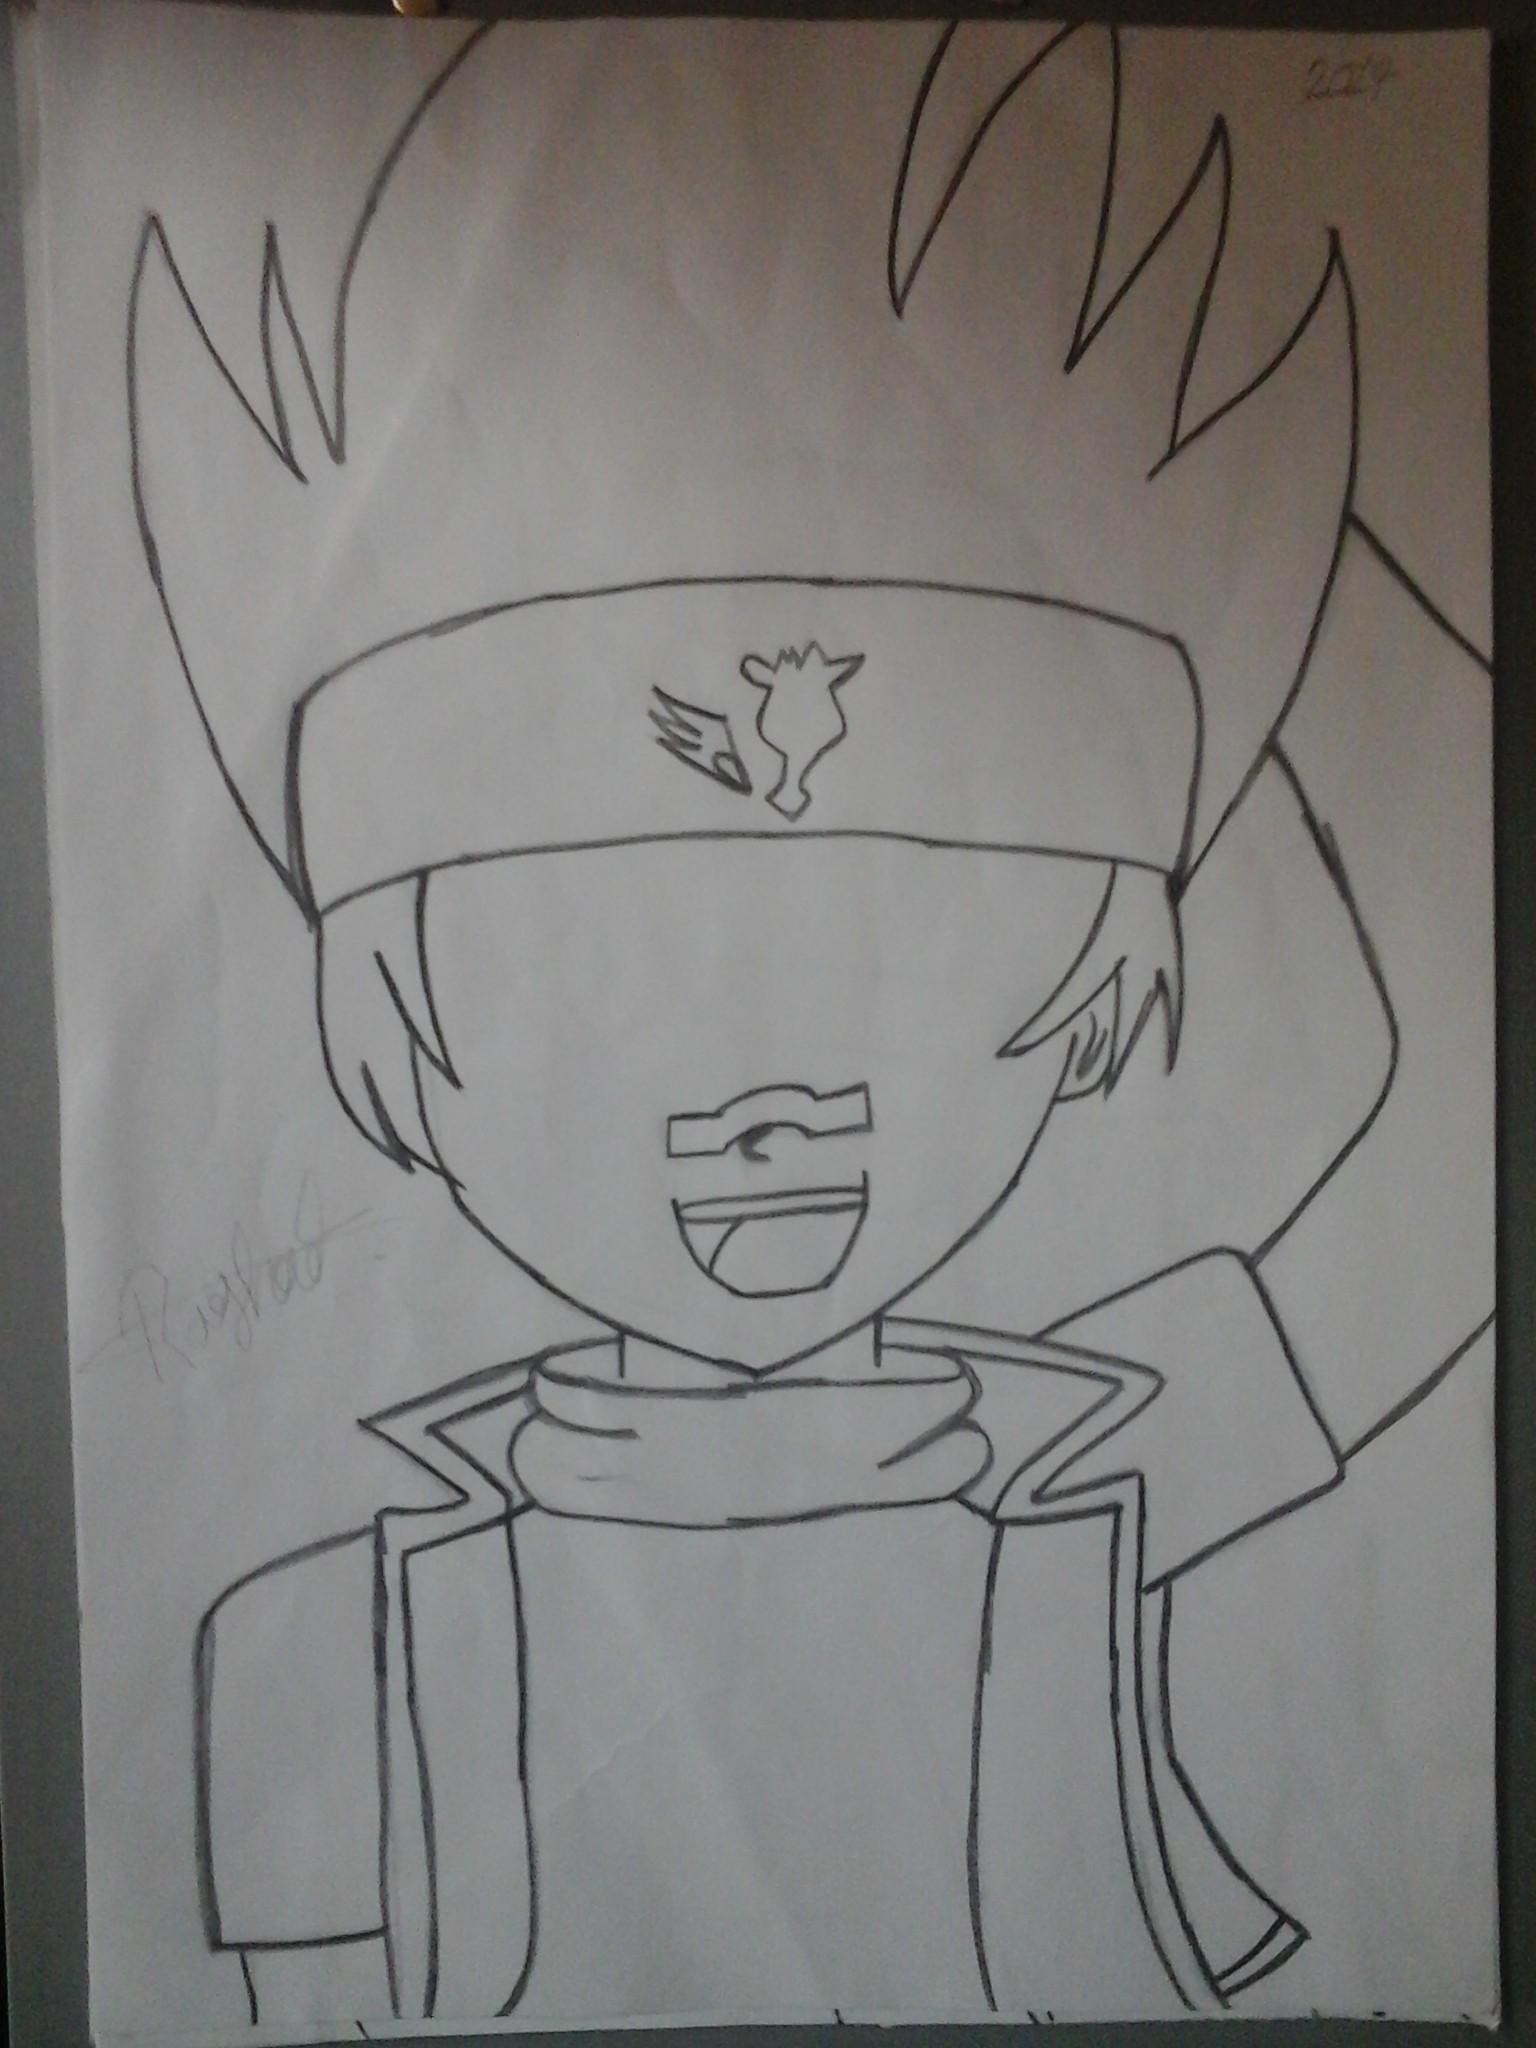 بالصور رسم انمي , شخصيات كرتونيه بالرسم باليد 3896 5